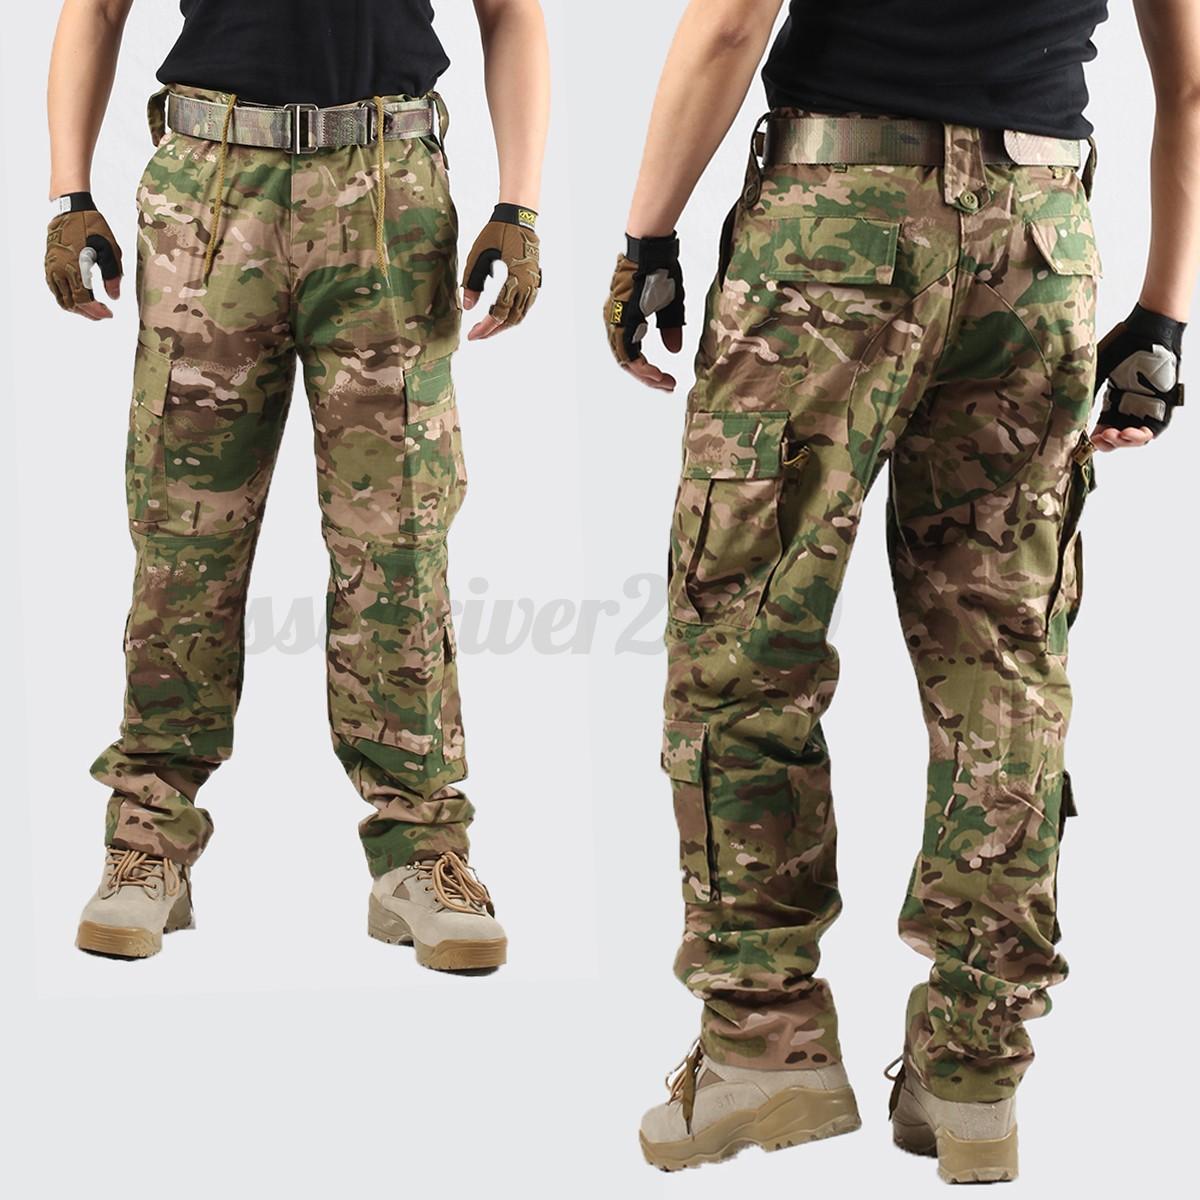 neuf fashion coton pantalon homme treillis cargo camouflage militaire trousers ebay. Black Bedroom Furniture Sets. Home Design Ideas